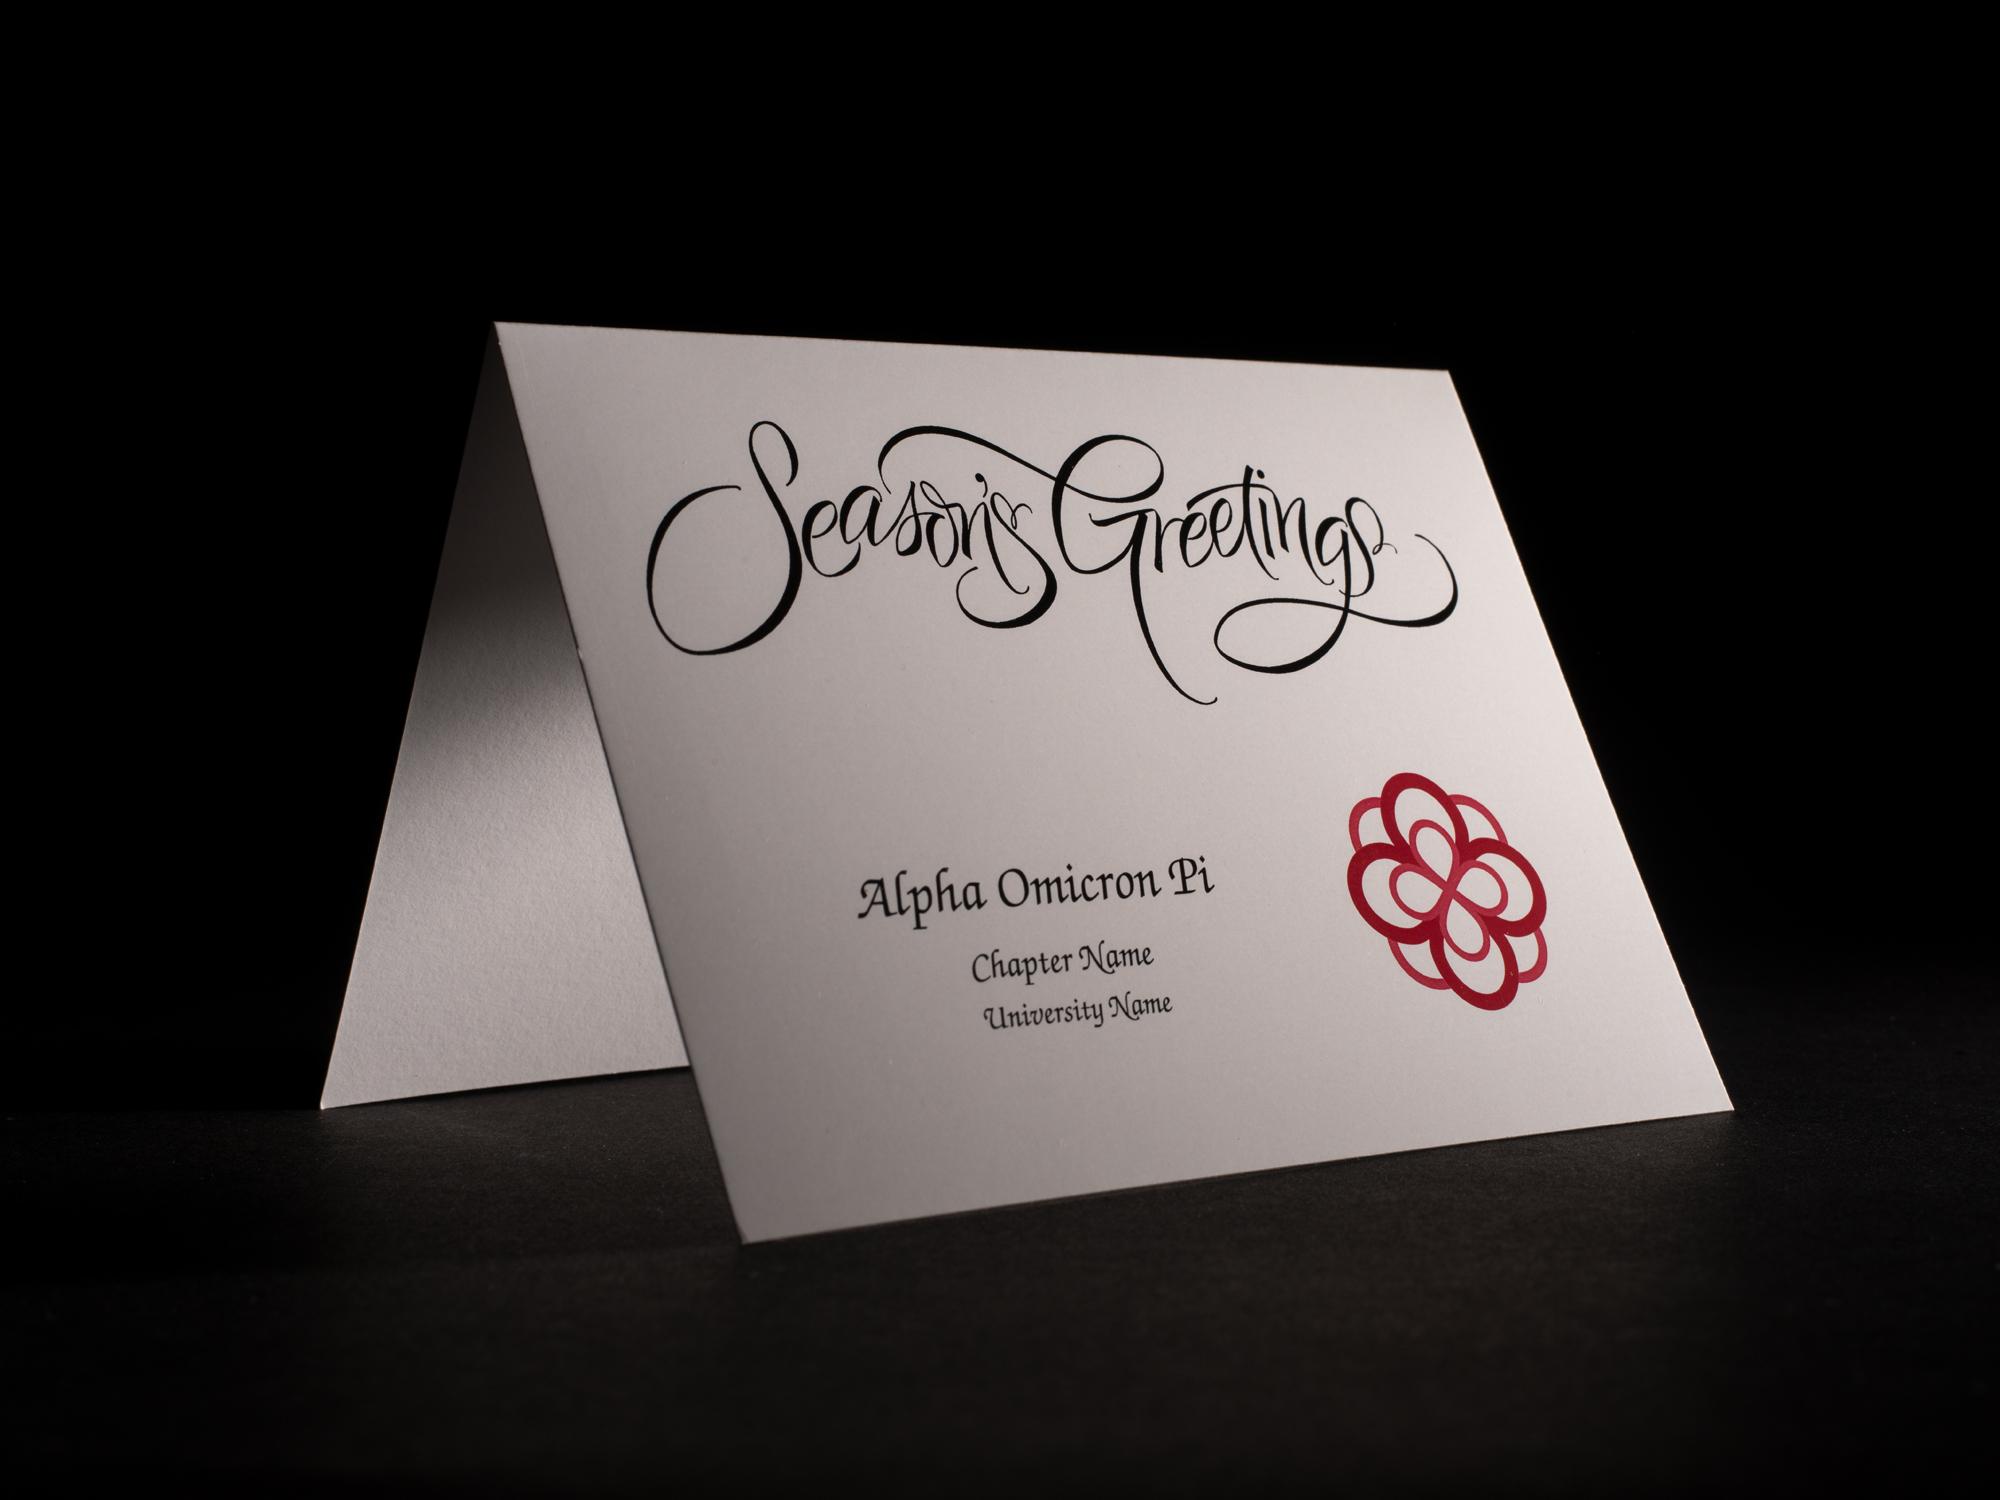 Seasons Greetings Cards Alpha Omicron Pi